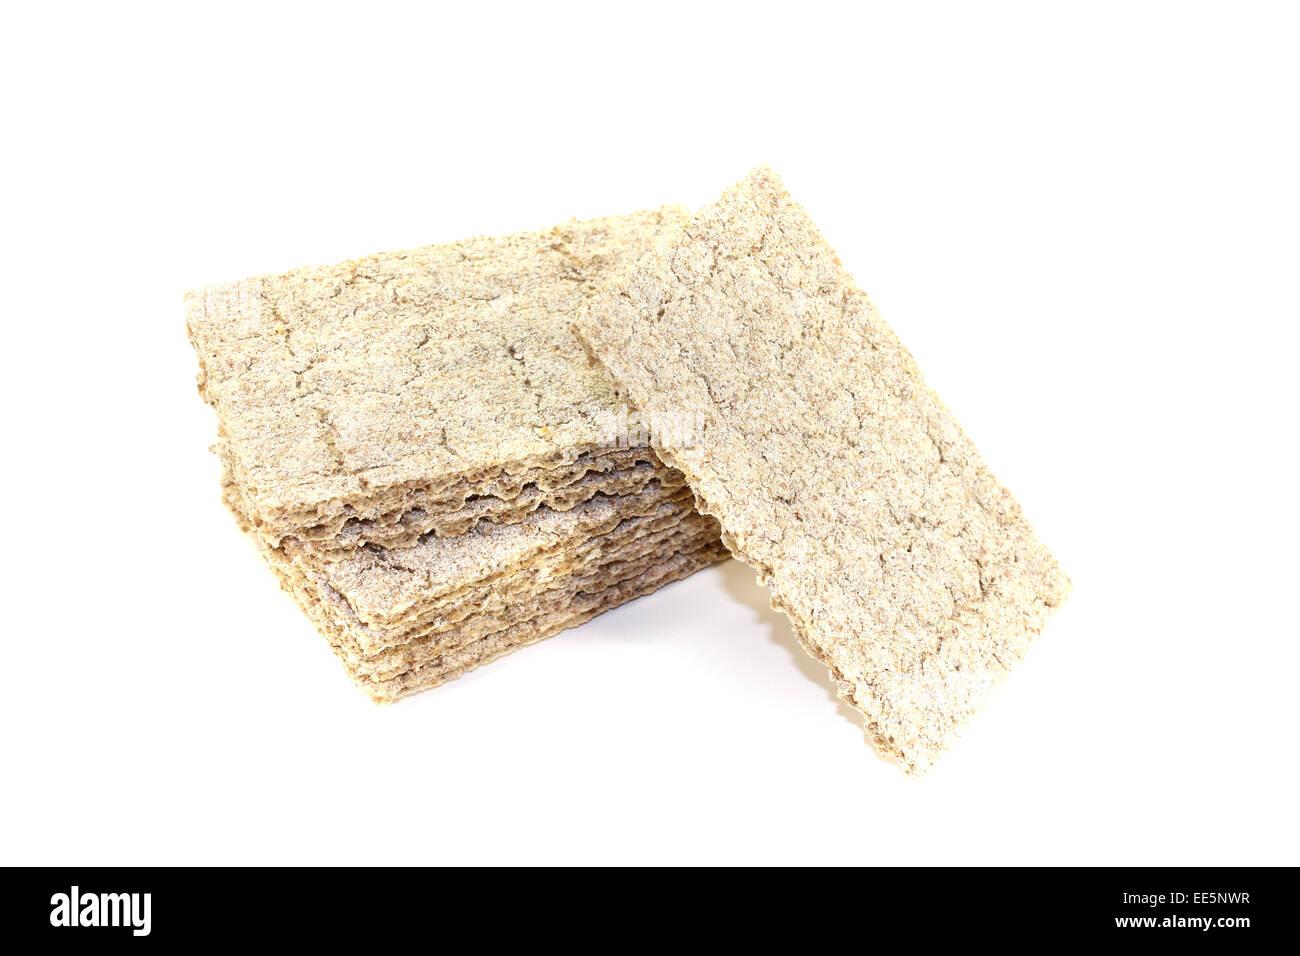 small stack of crisp crispbread on a light background - Stock Image